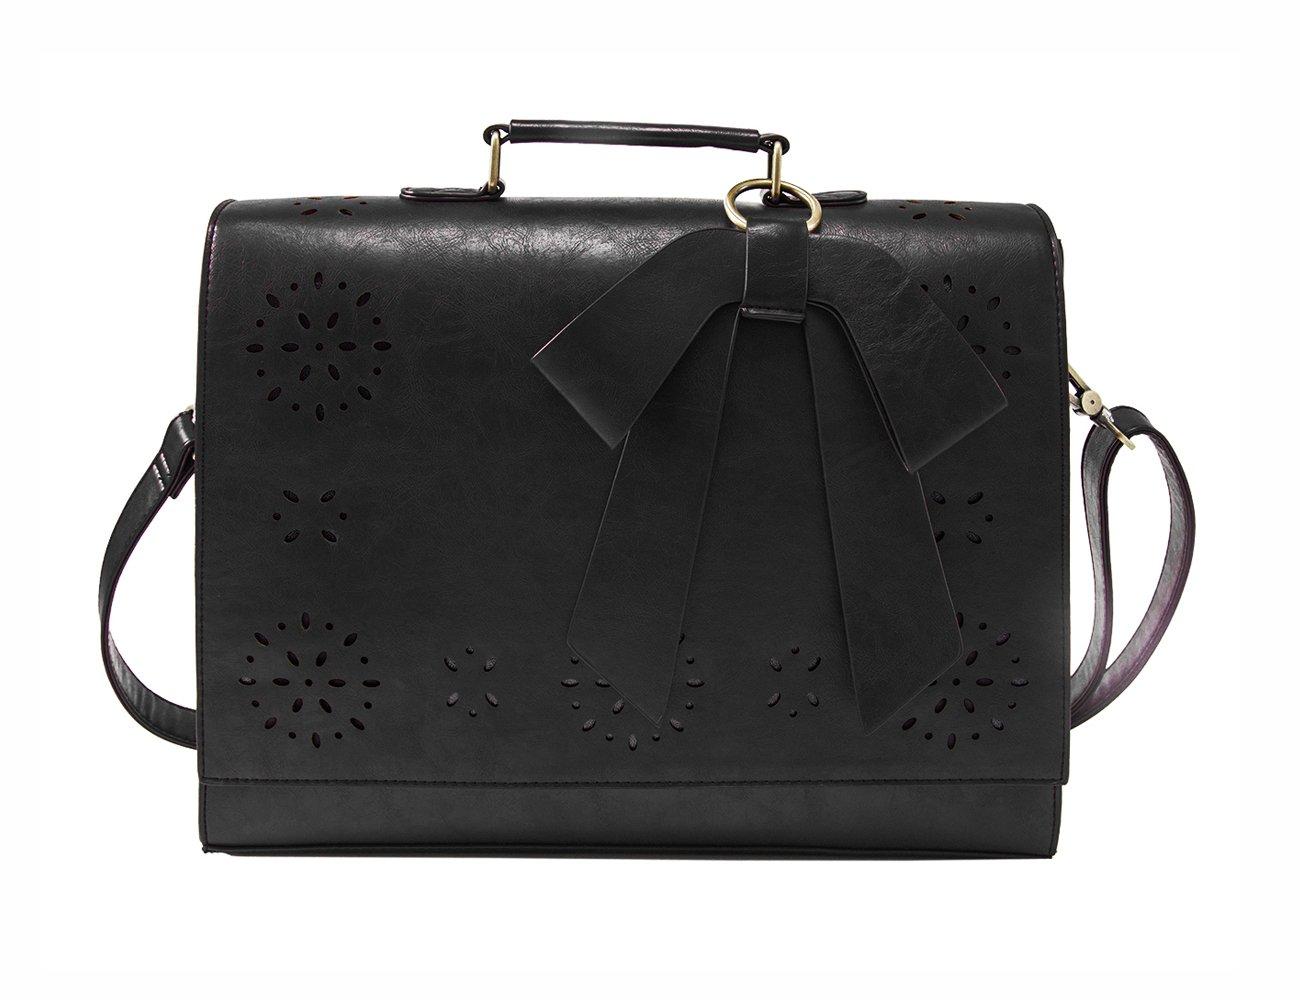 "ECOSUSI Ladies PU Leather Laptop Bag Briefcase Crossbody Messenger Bags Satchel Purse Fit 14"" Laptop, Black"